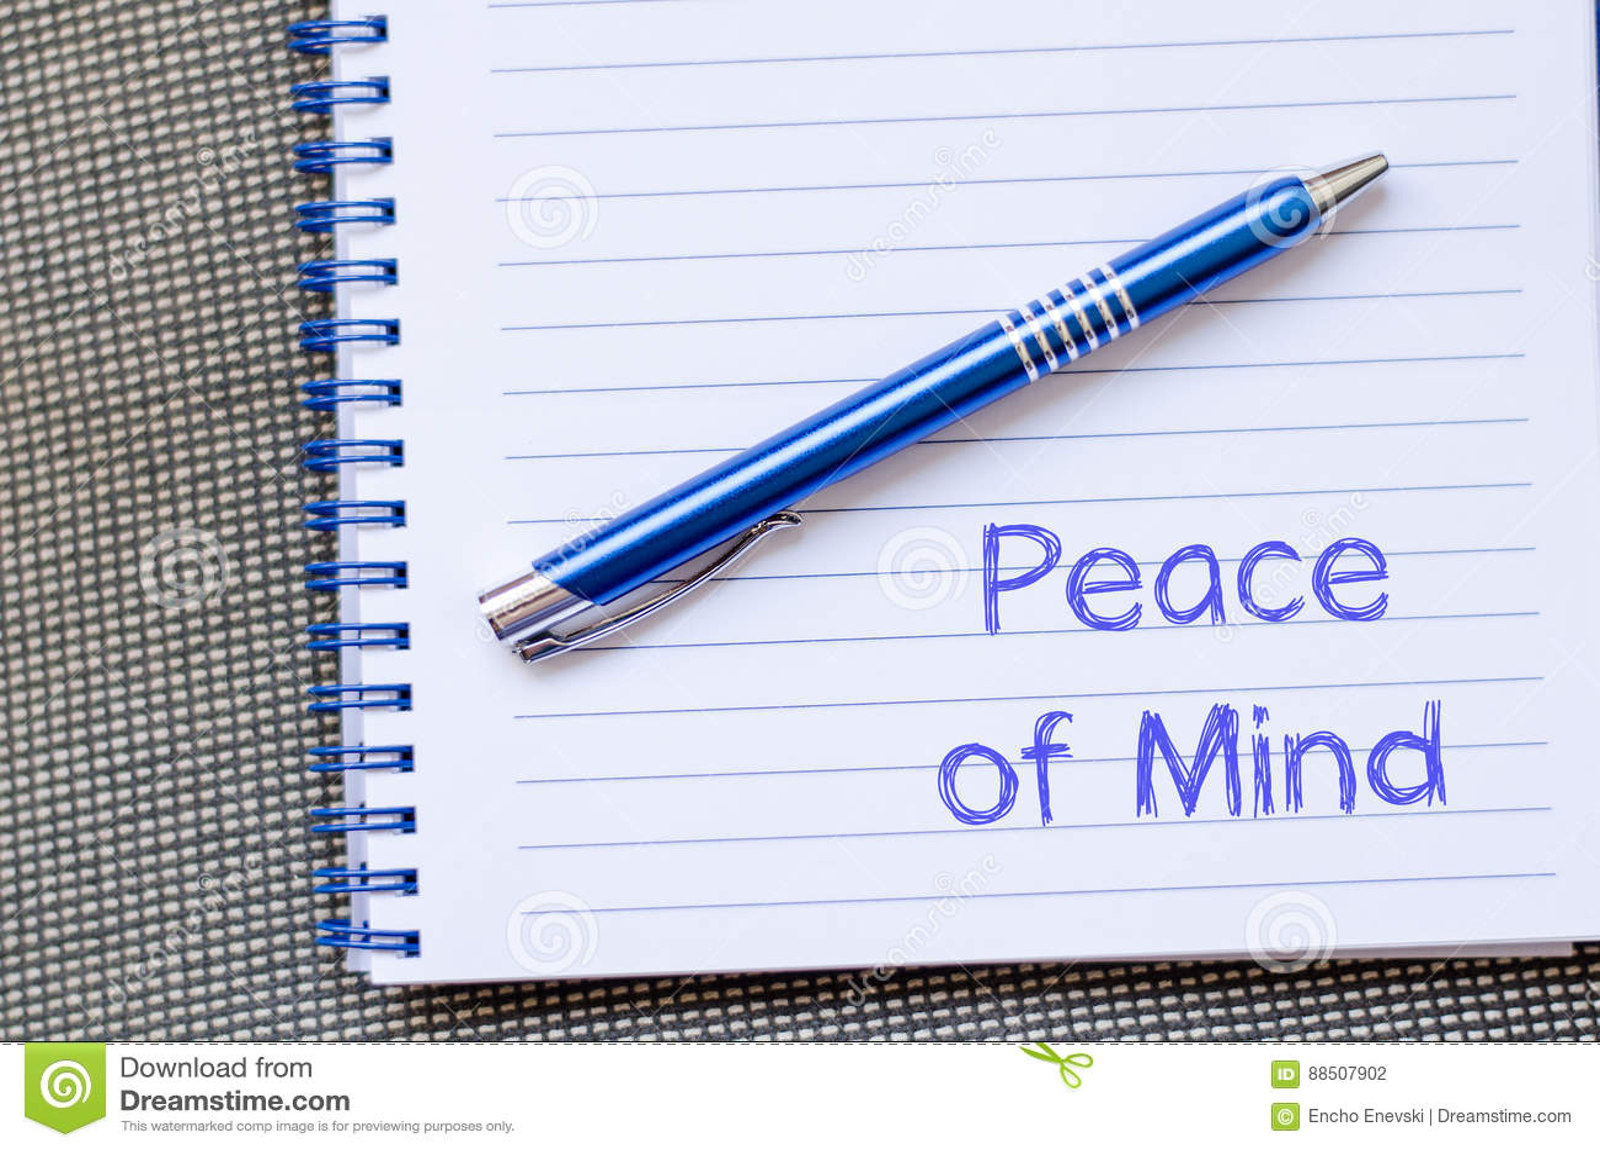 Fred av meningen skriver på anteckningsboken